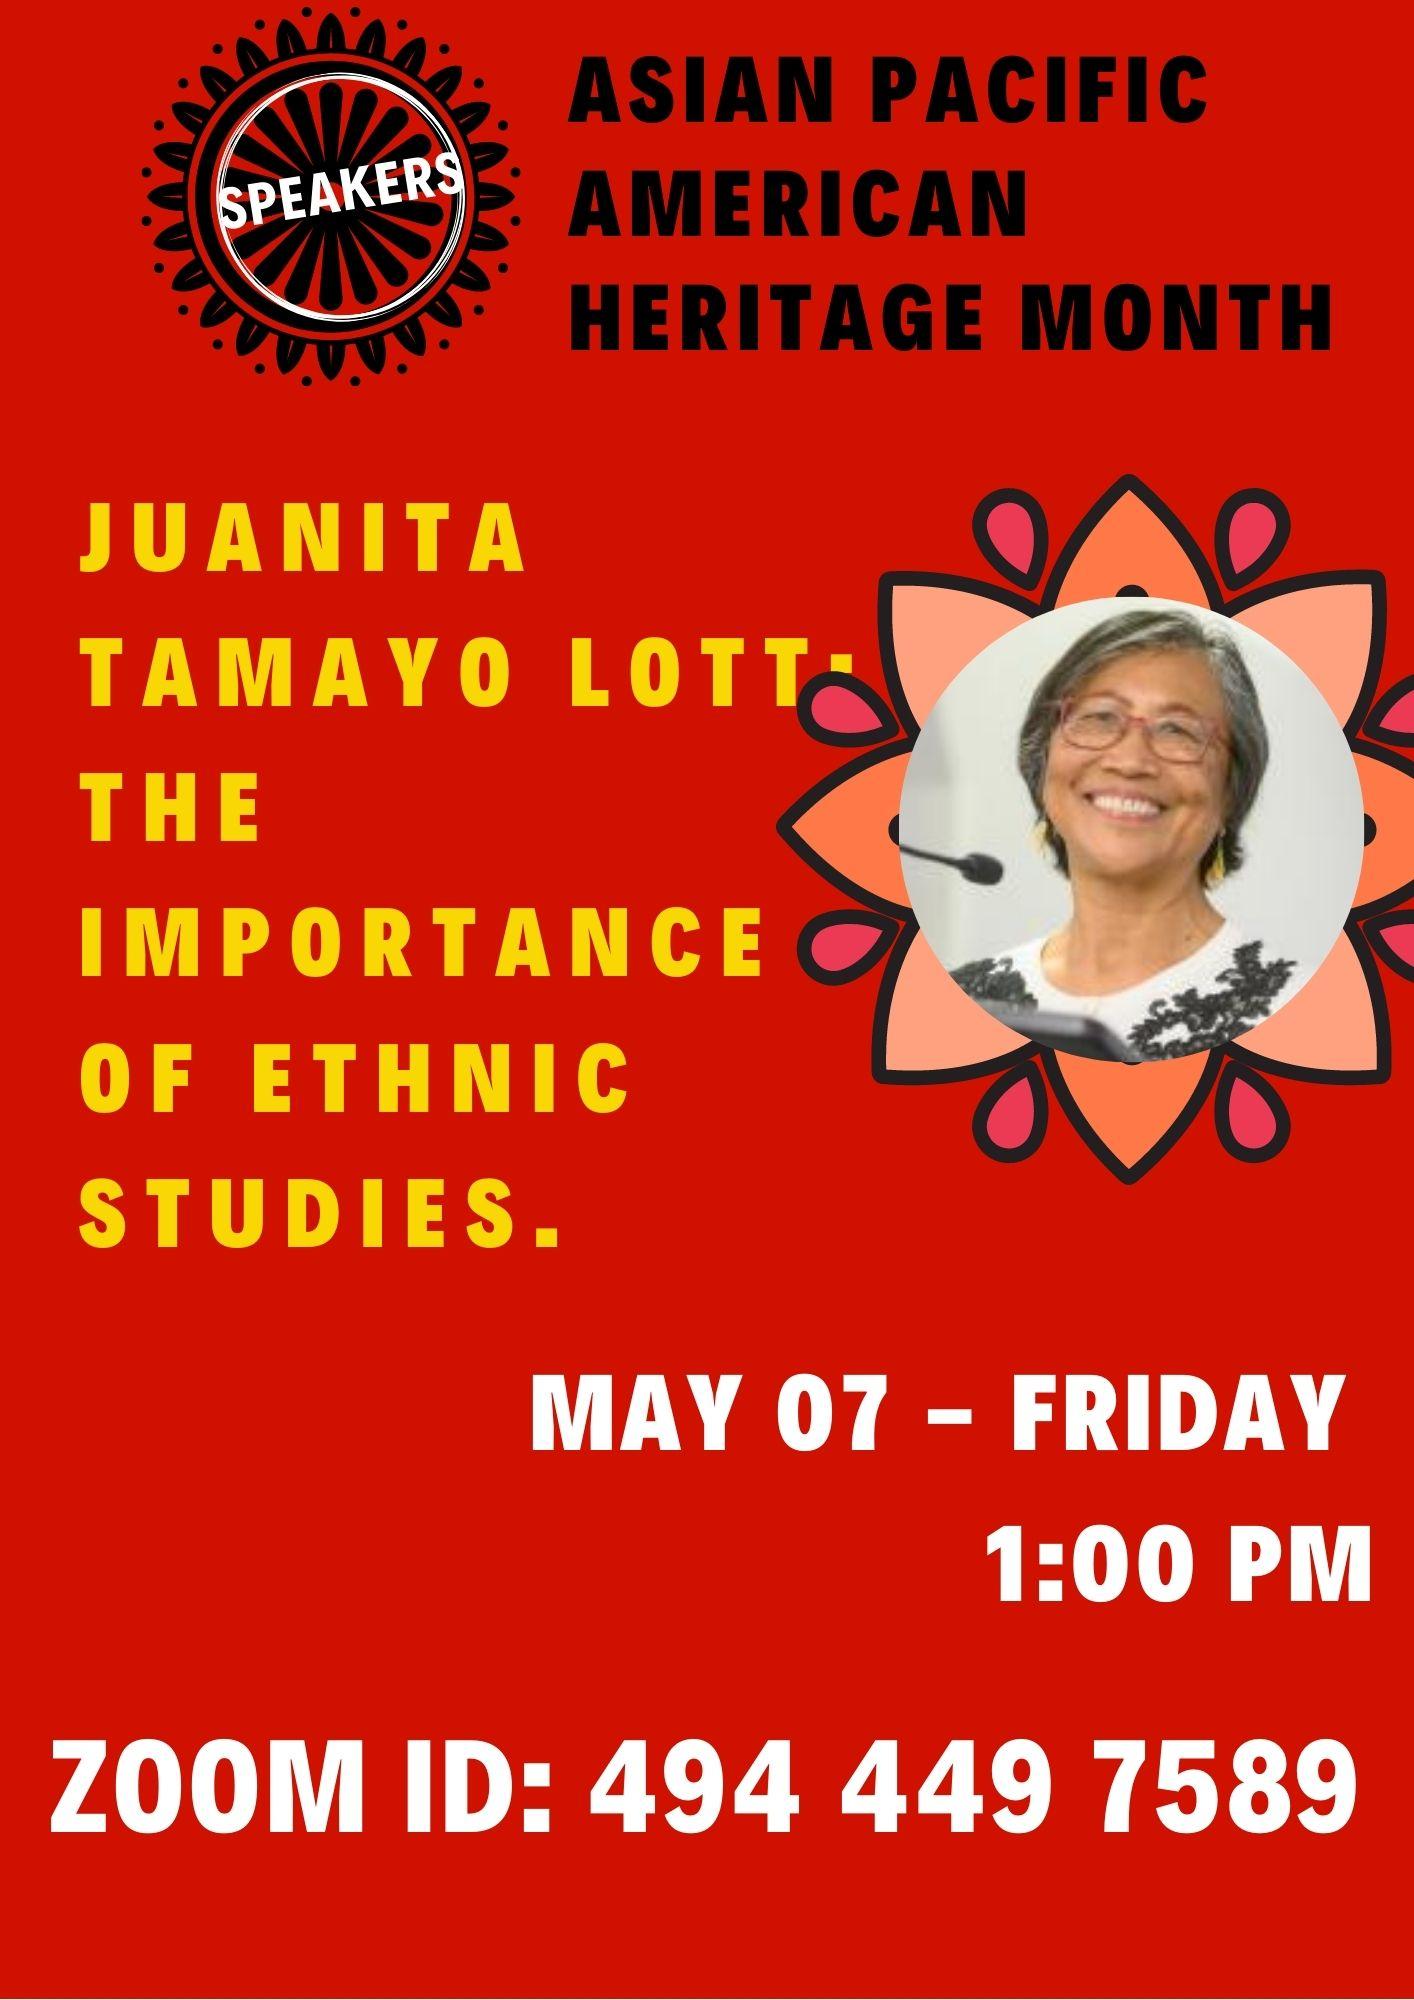 Speaker: Juanita Tamayo Lott